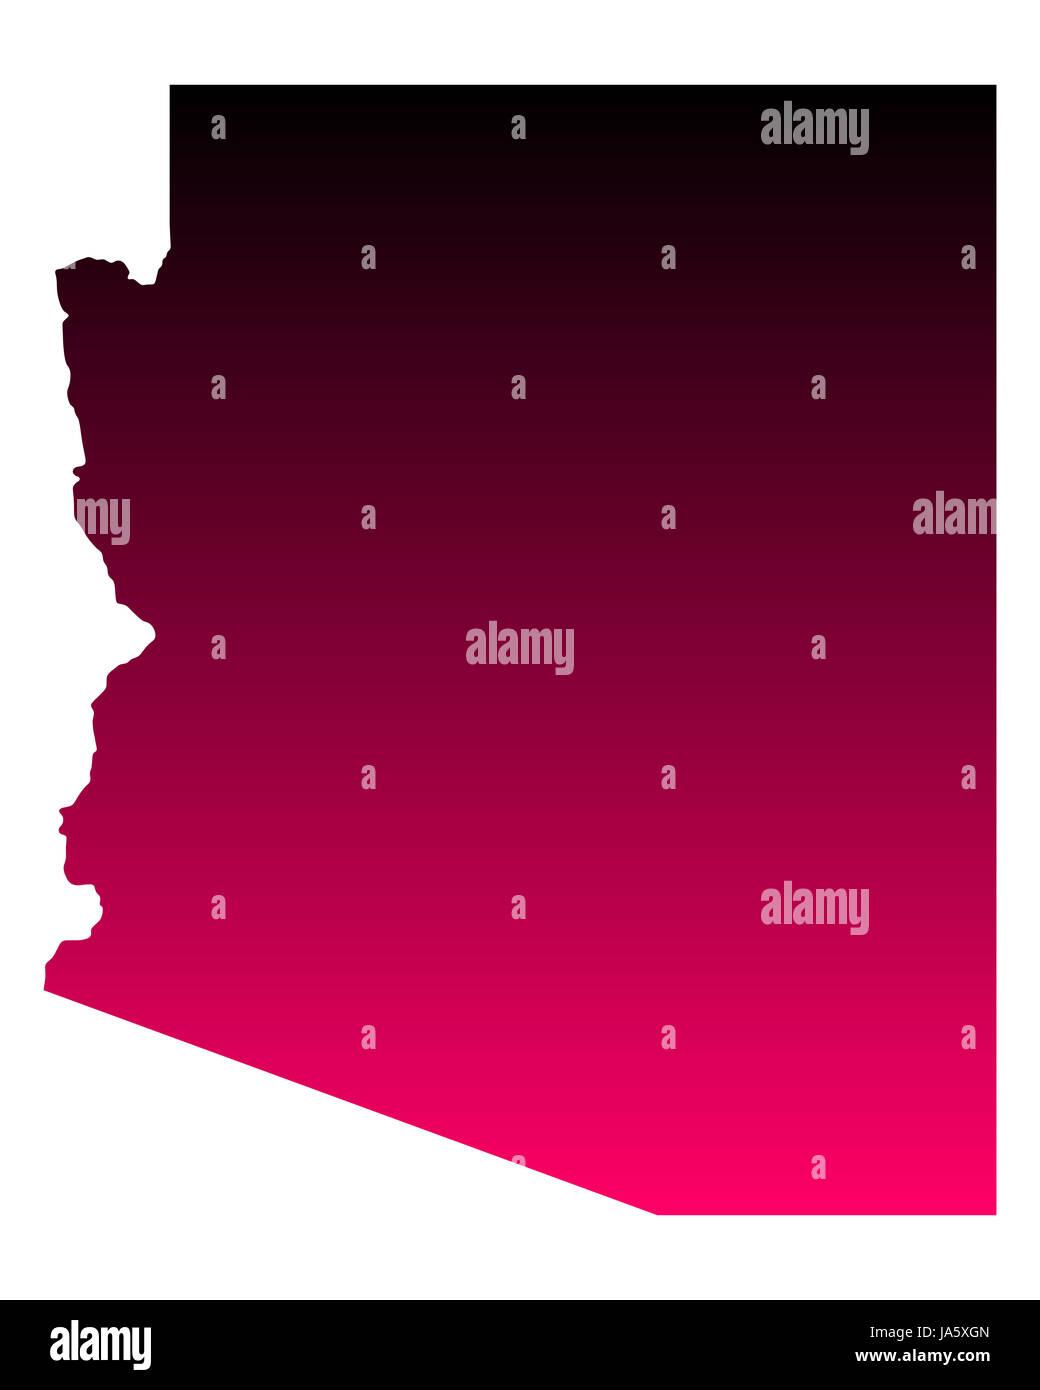 Karte von Arizona - Stock Image